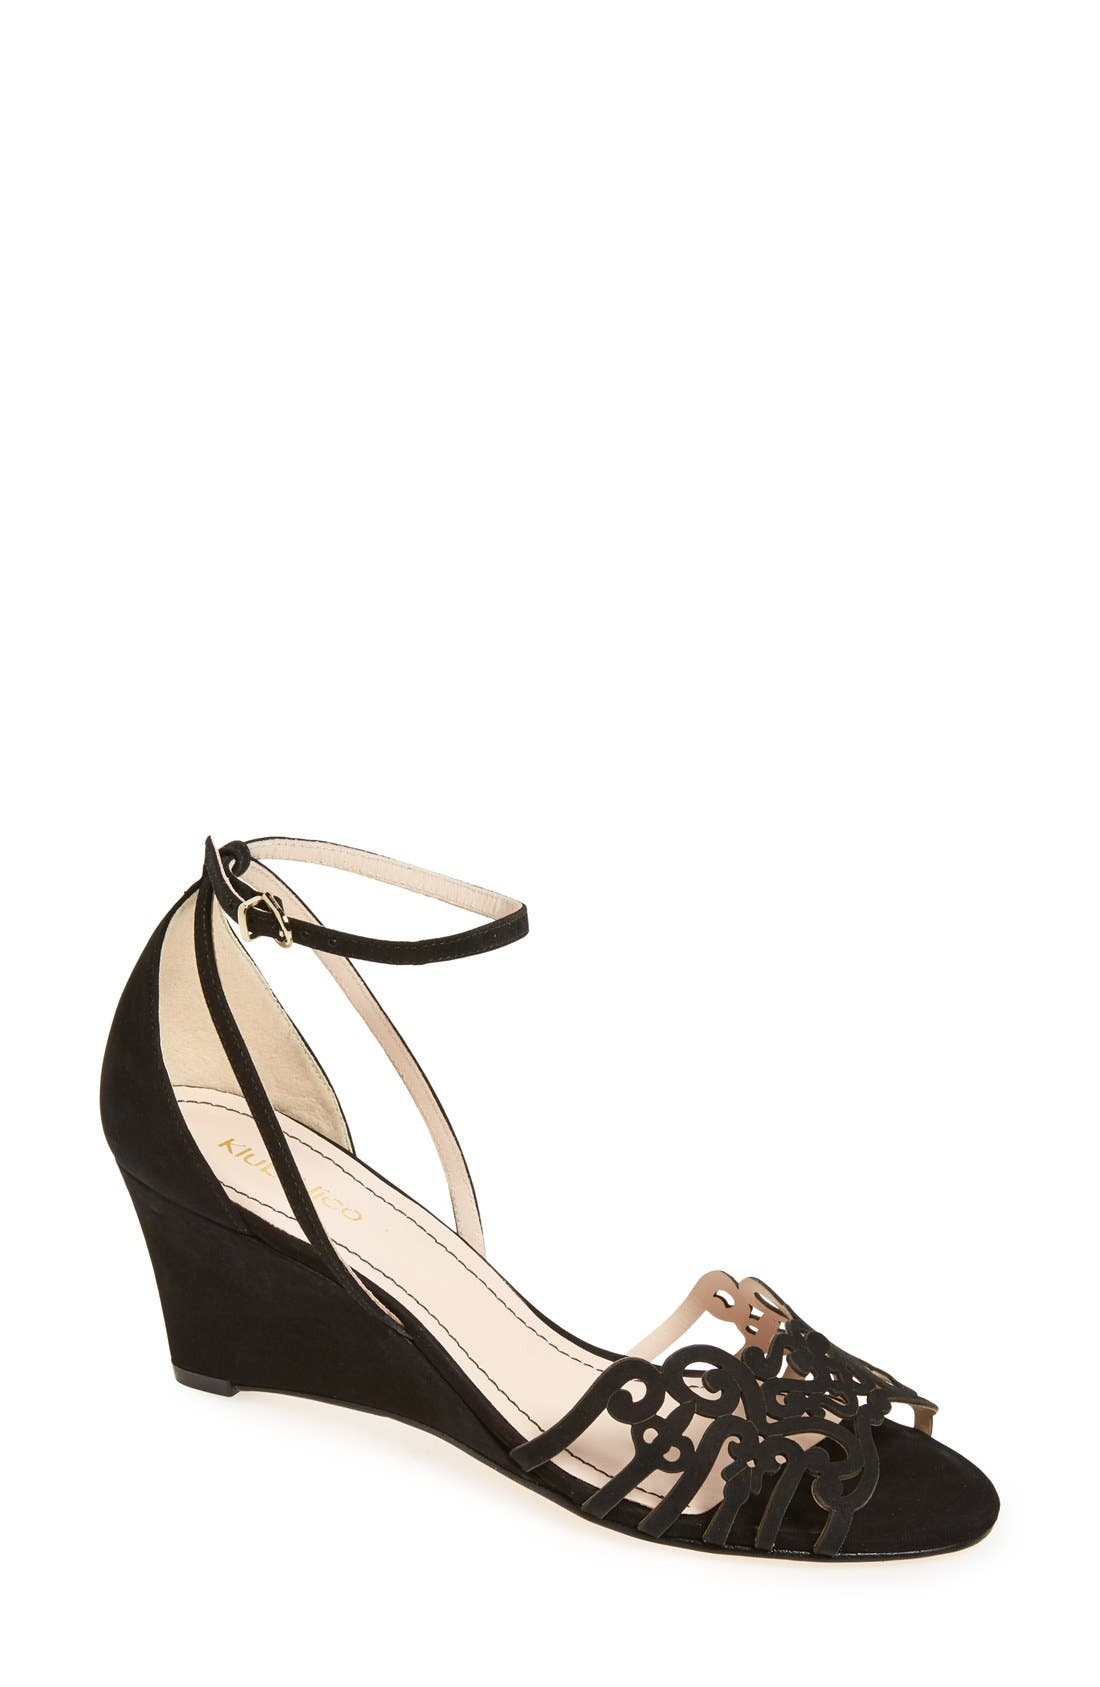 'Kingston' Ankle Strap Wedge Sandal,                             Main thumbnail 1, color,                             Black Nubuck Leather